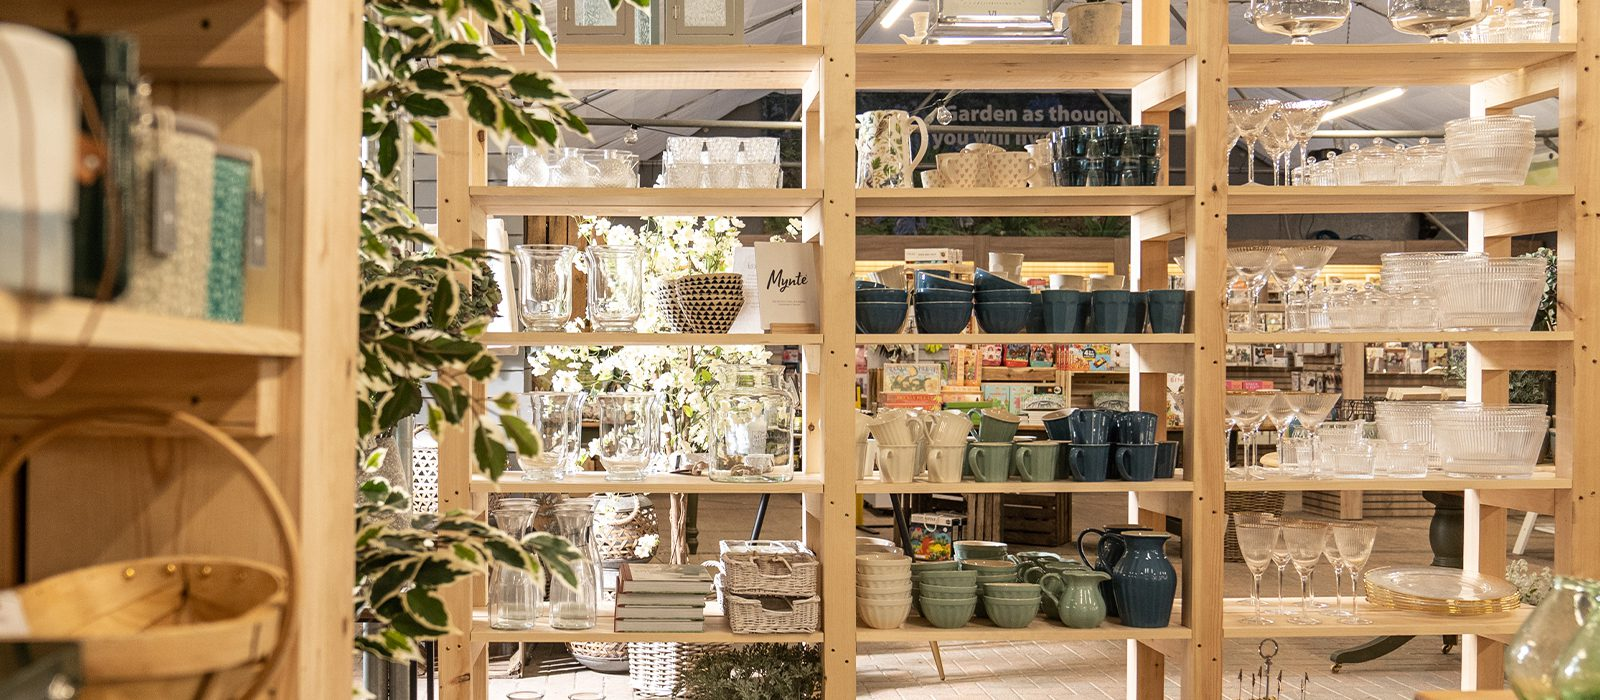 Yarnton Home & Garden, Kidlington, Oxford - Home Furnishings for Sale